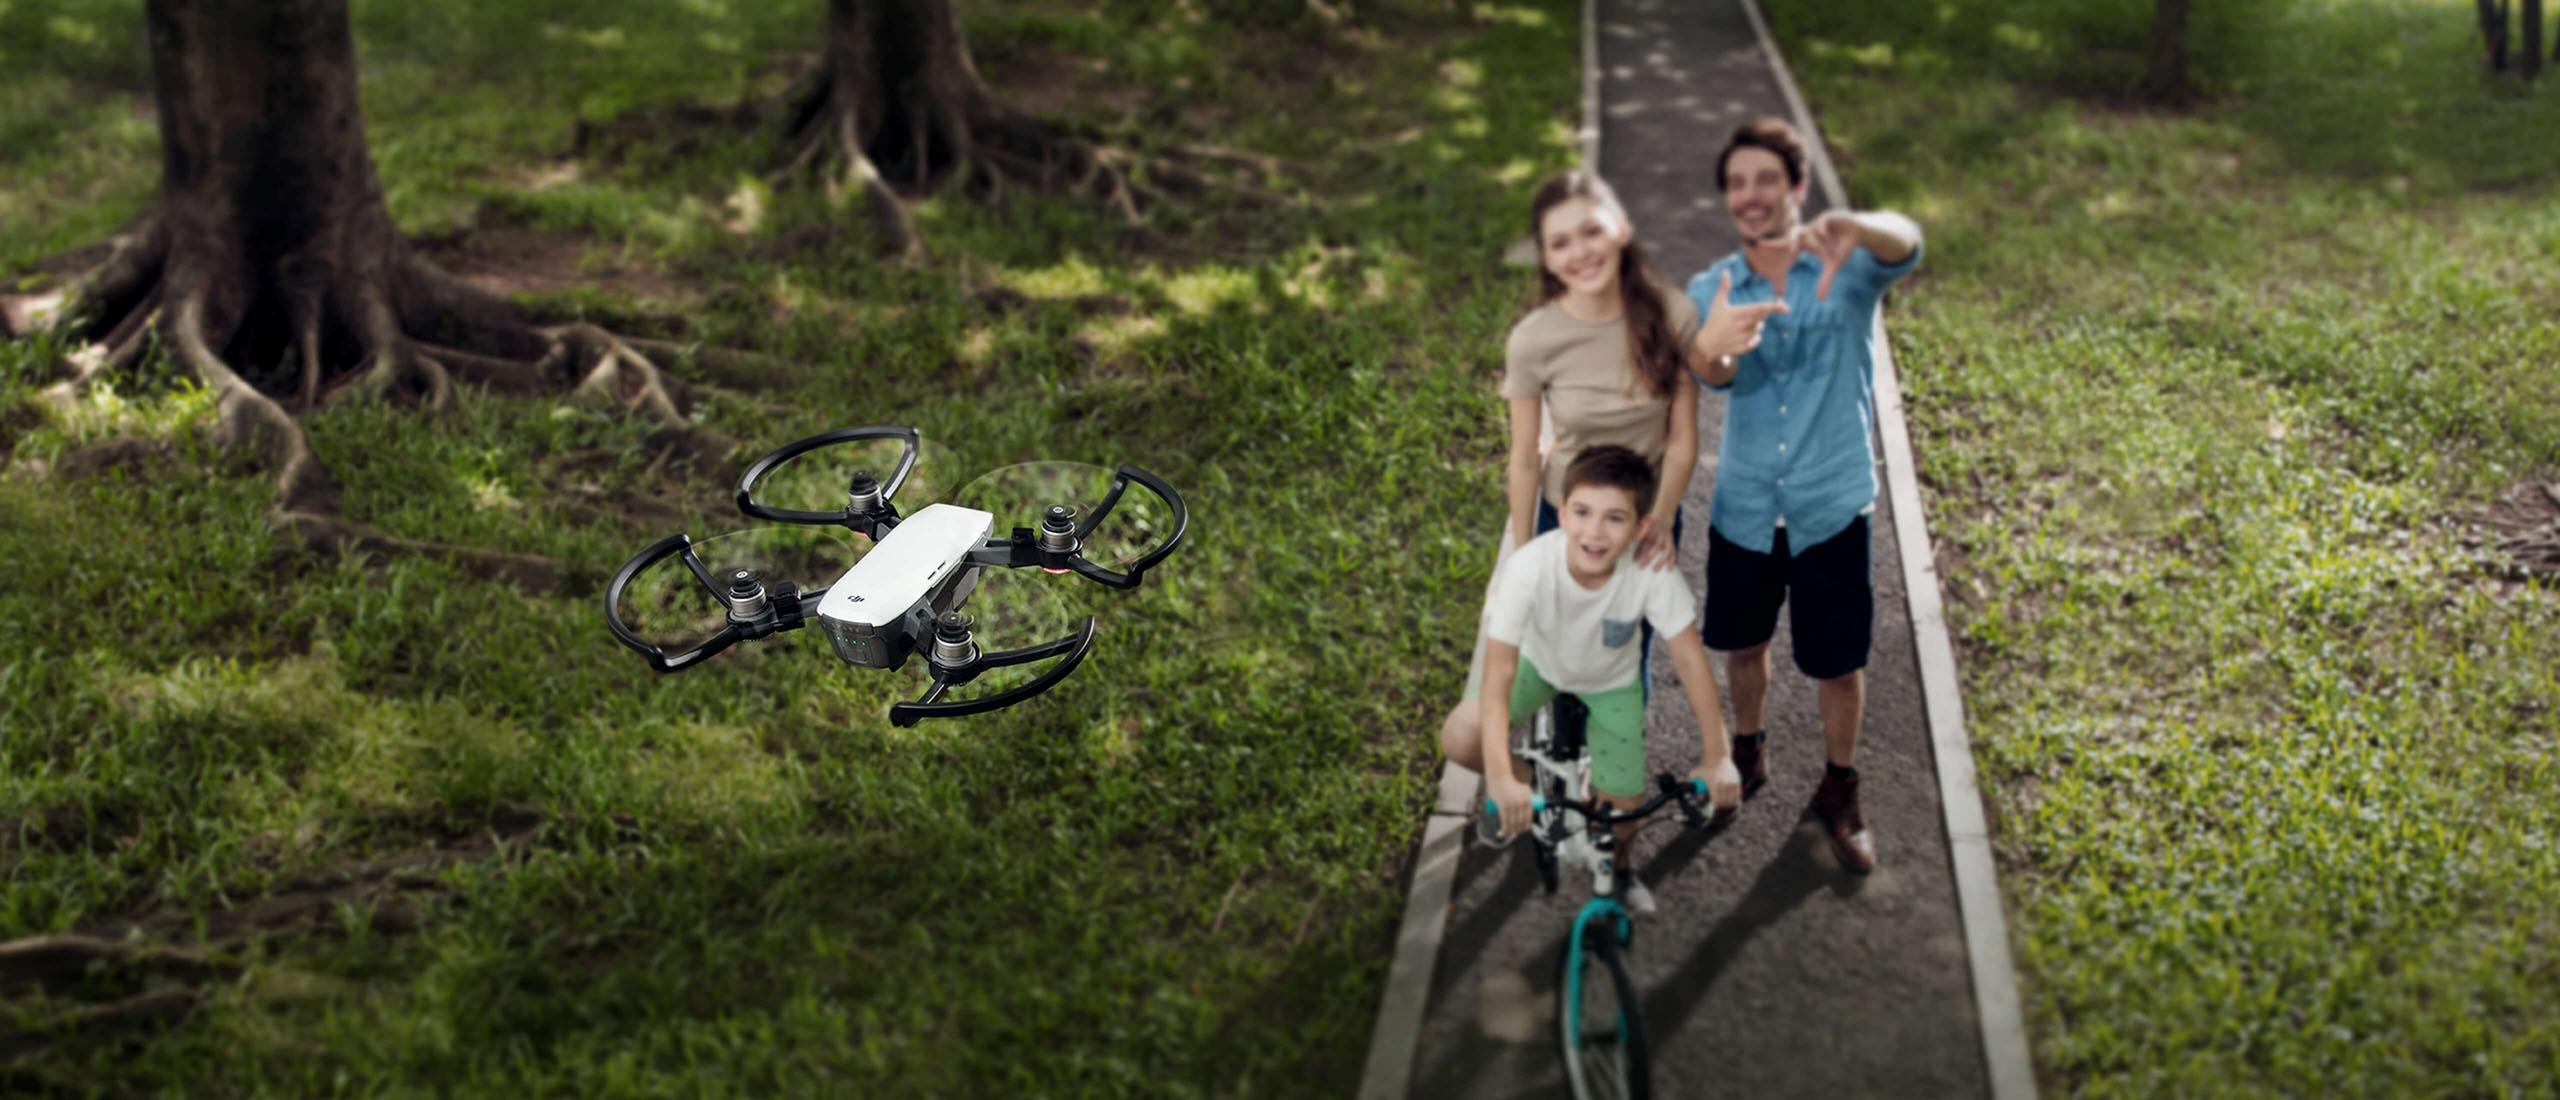 dji-spark-droon-photopoint-kaupokalda